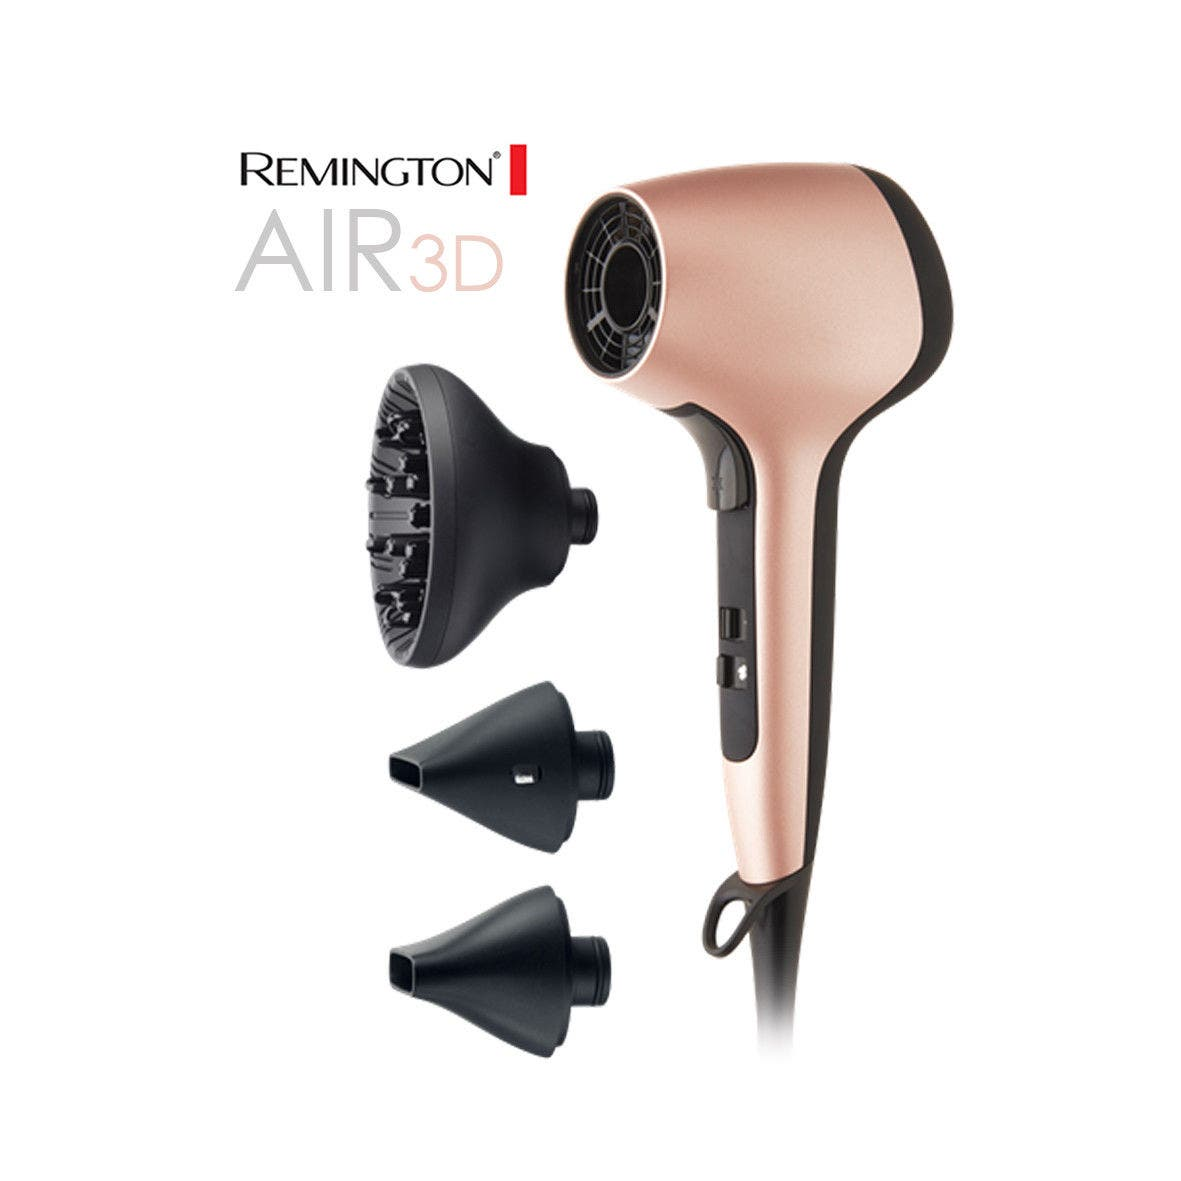 Remington AIR 3D Hair Dryer - 3D Airflow Rose Gold Hair Dryer - D7777AU